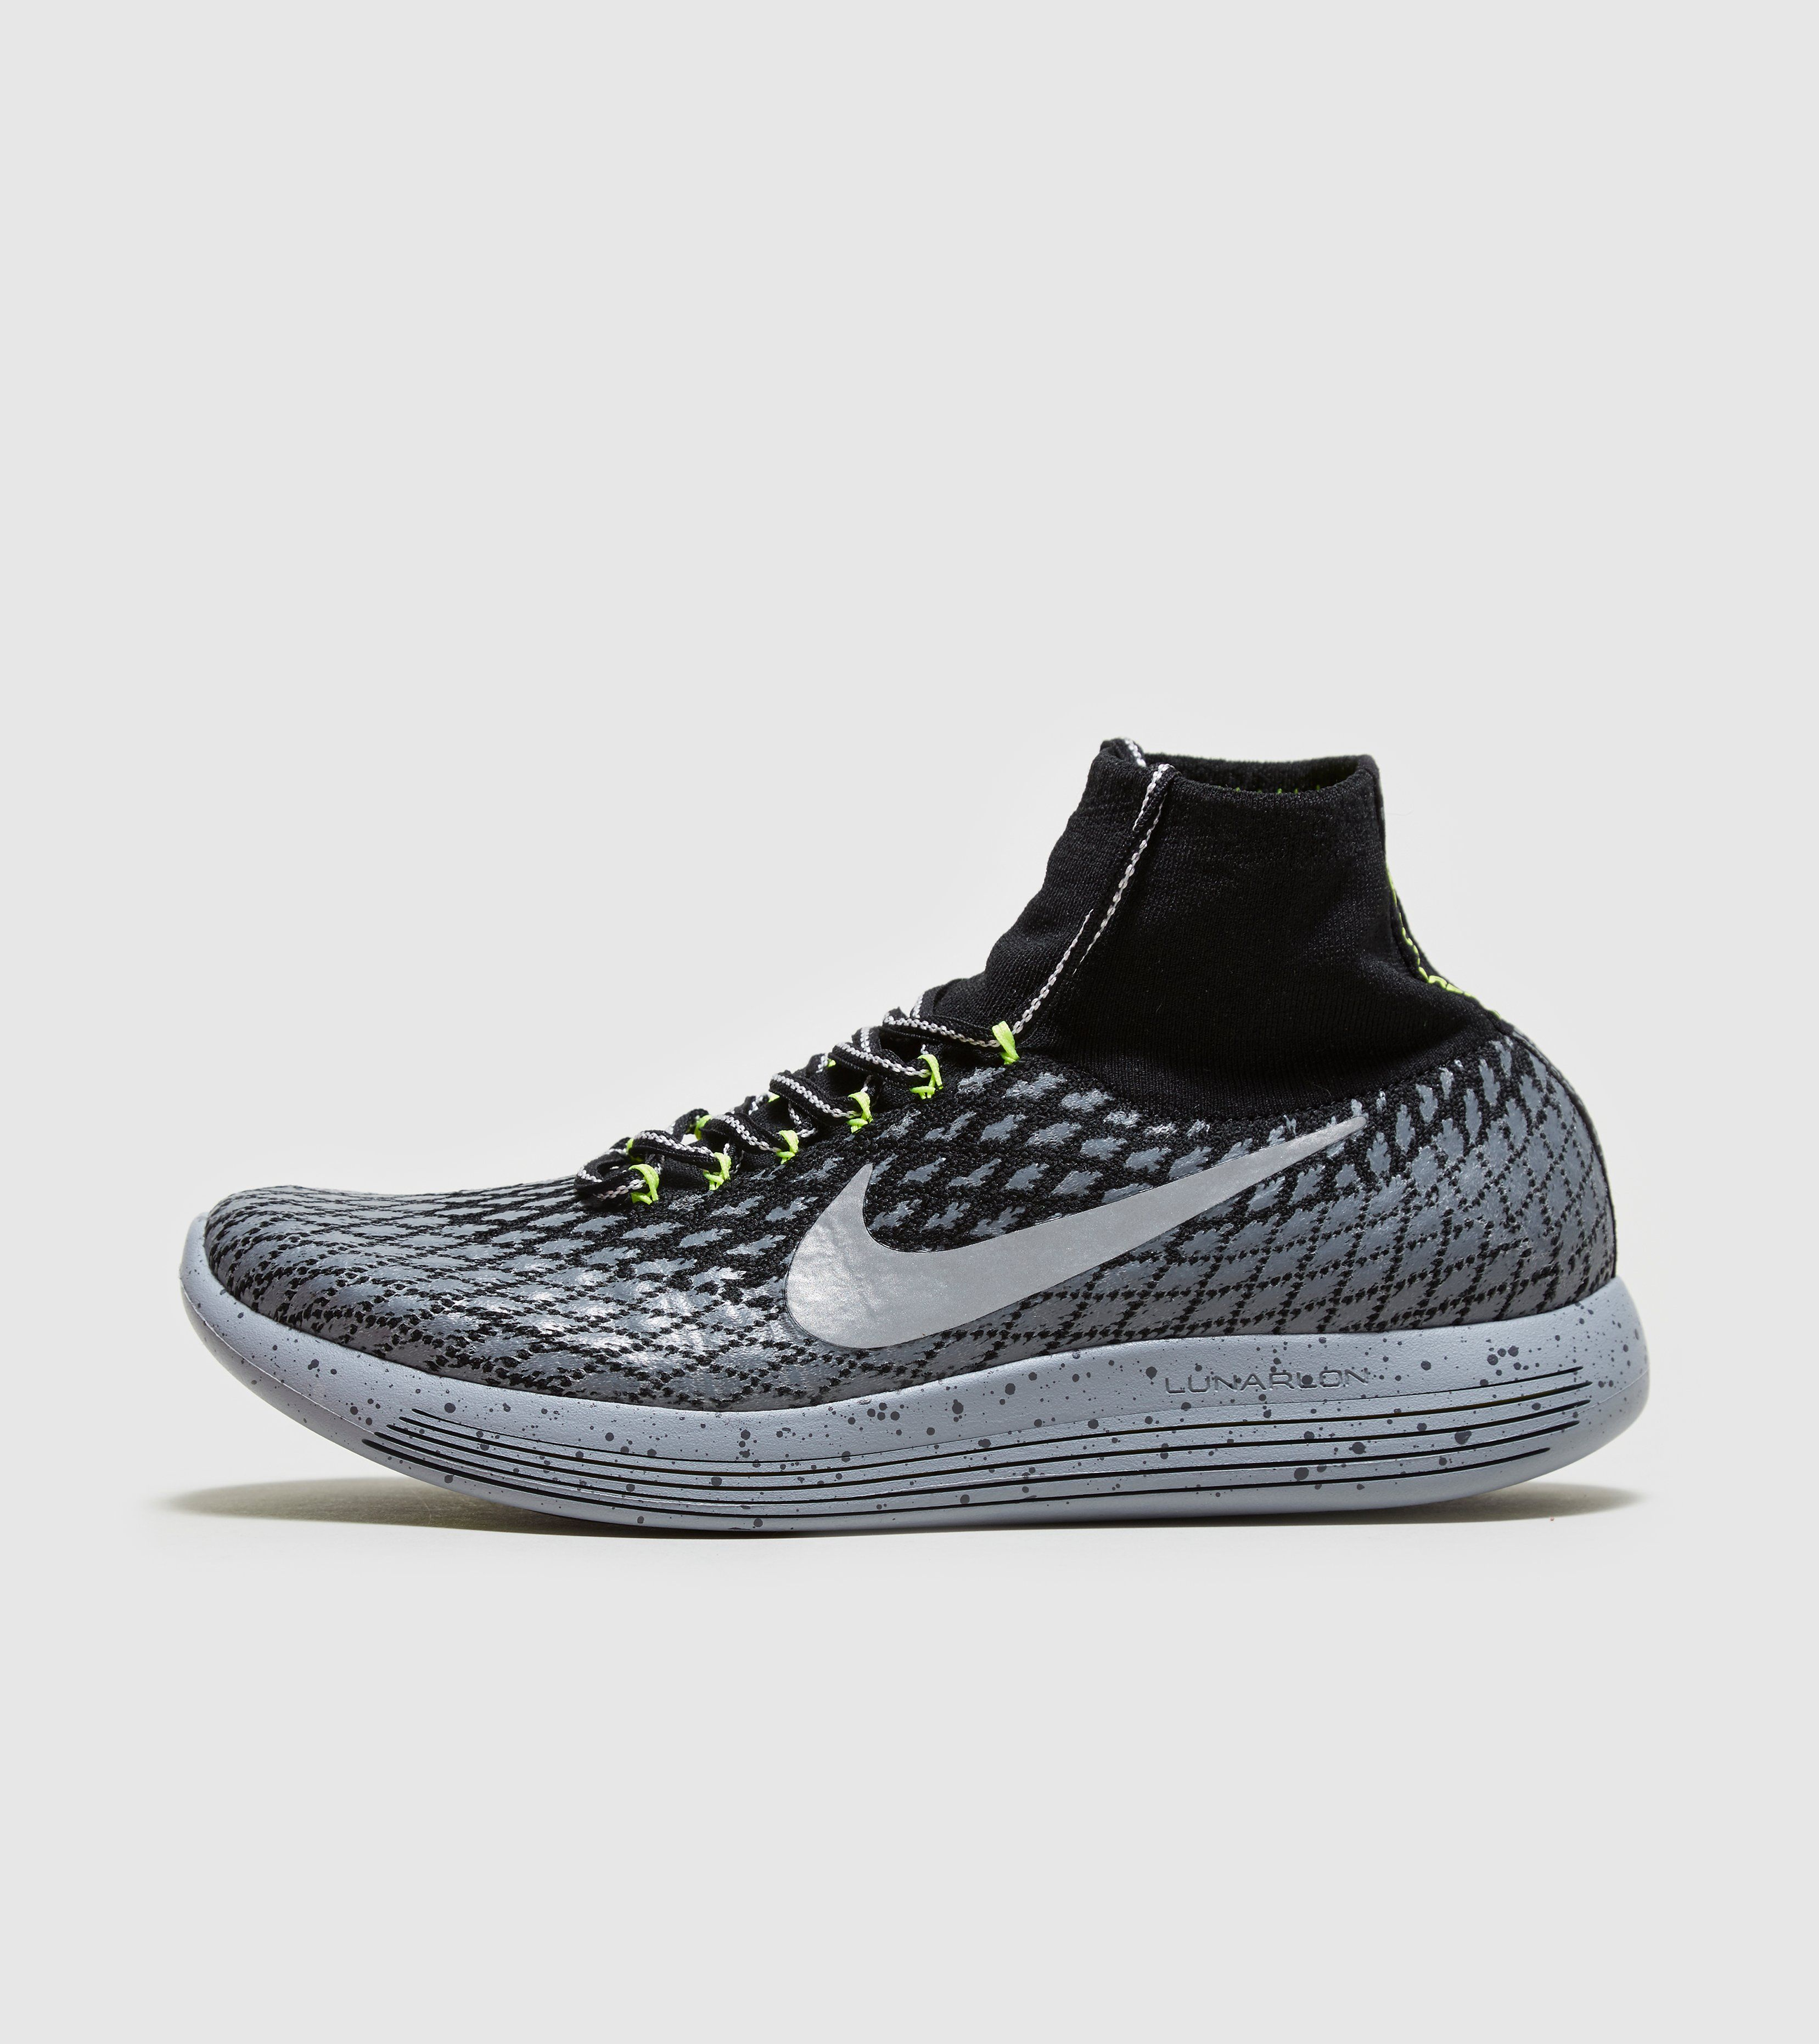 765f7c629fff Nike LunarEpic Flyknit Shield